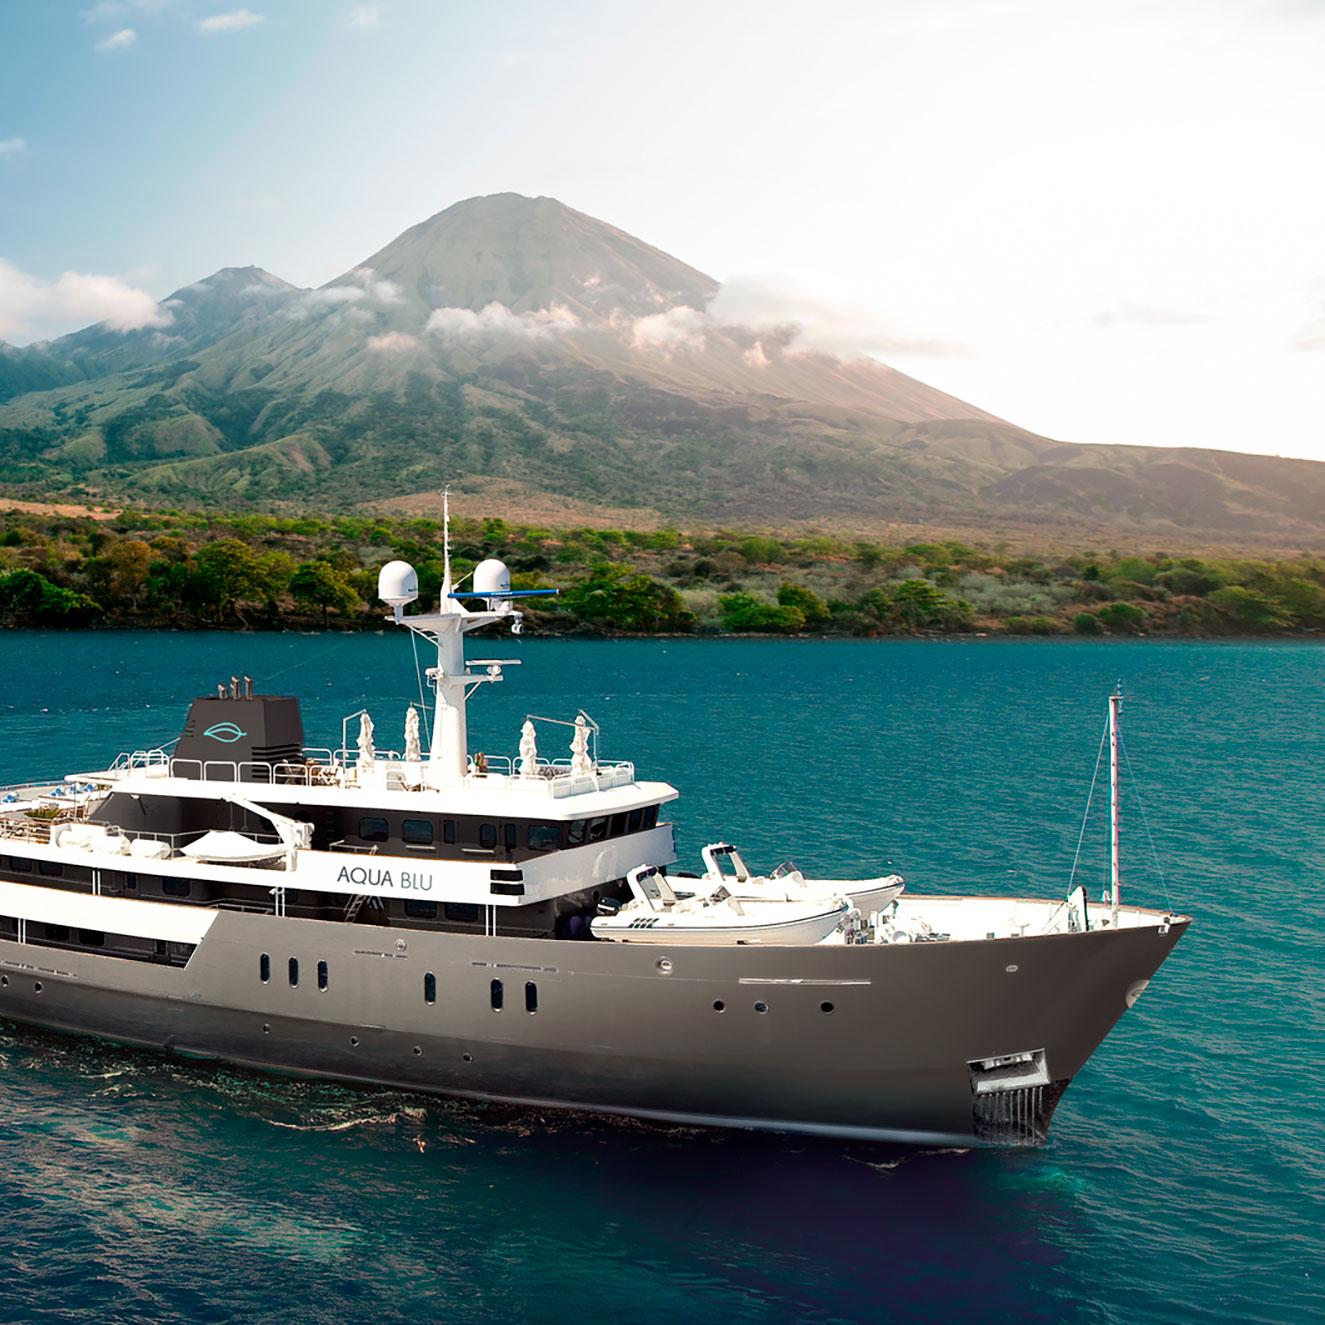 Viajes a medida | Crucero AQUA BLU de 12 noches - Flores to Spice Islands-Cruceros de lujo